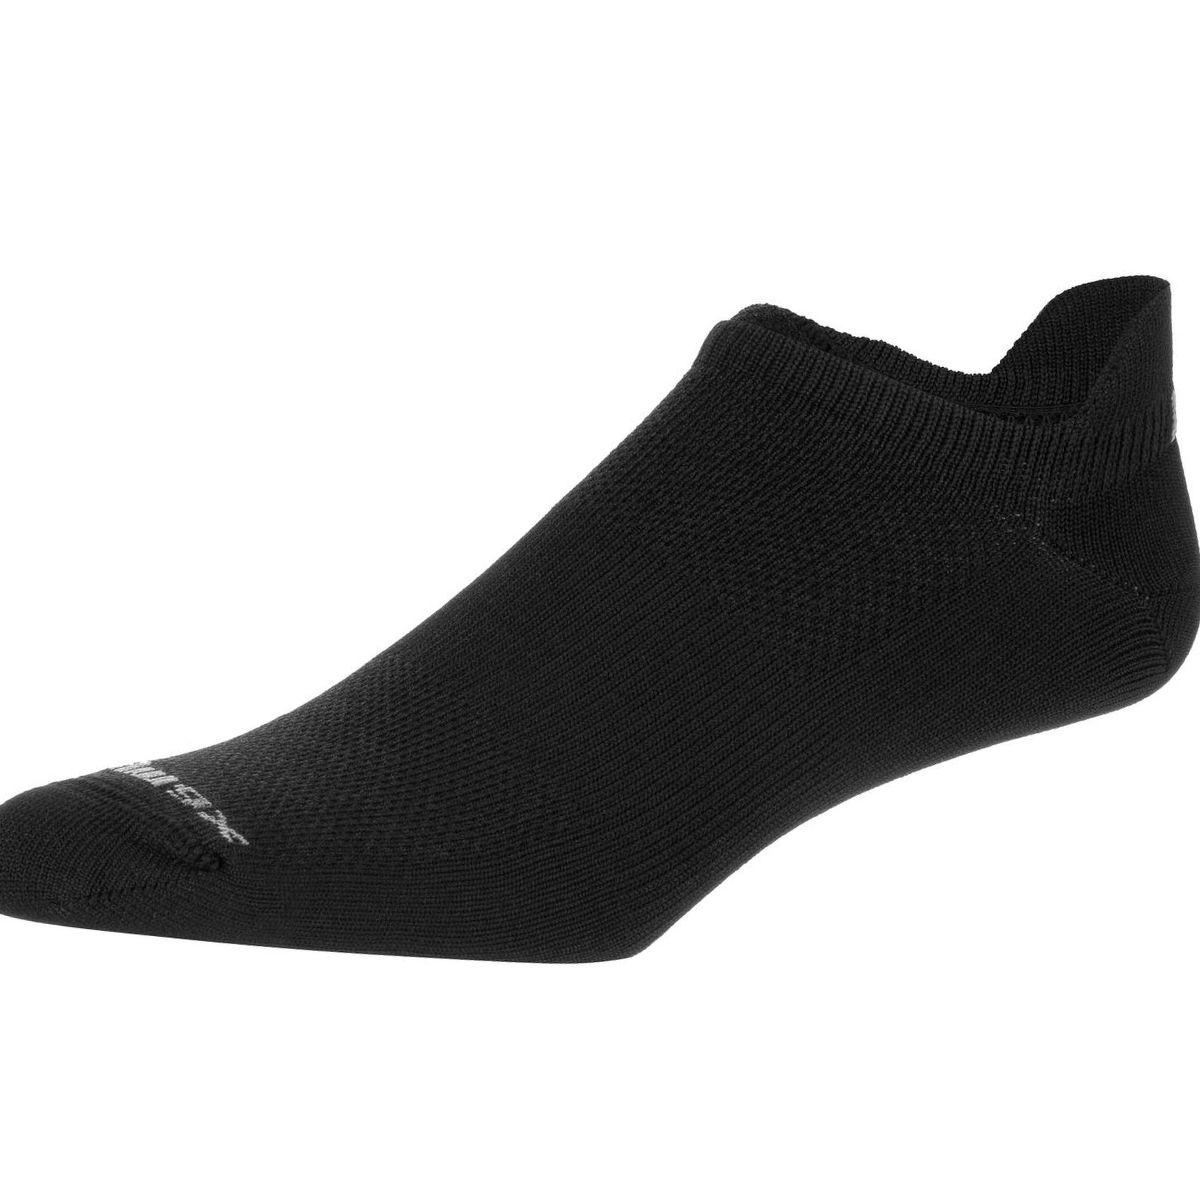 Drymax Thin No Show Tab Running Sock - Women's